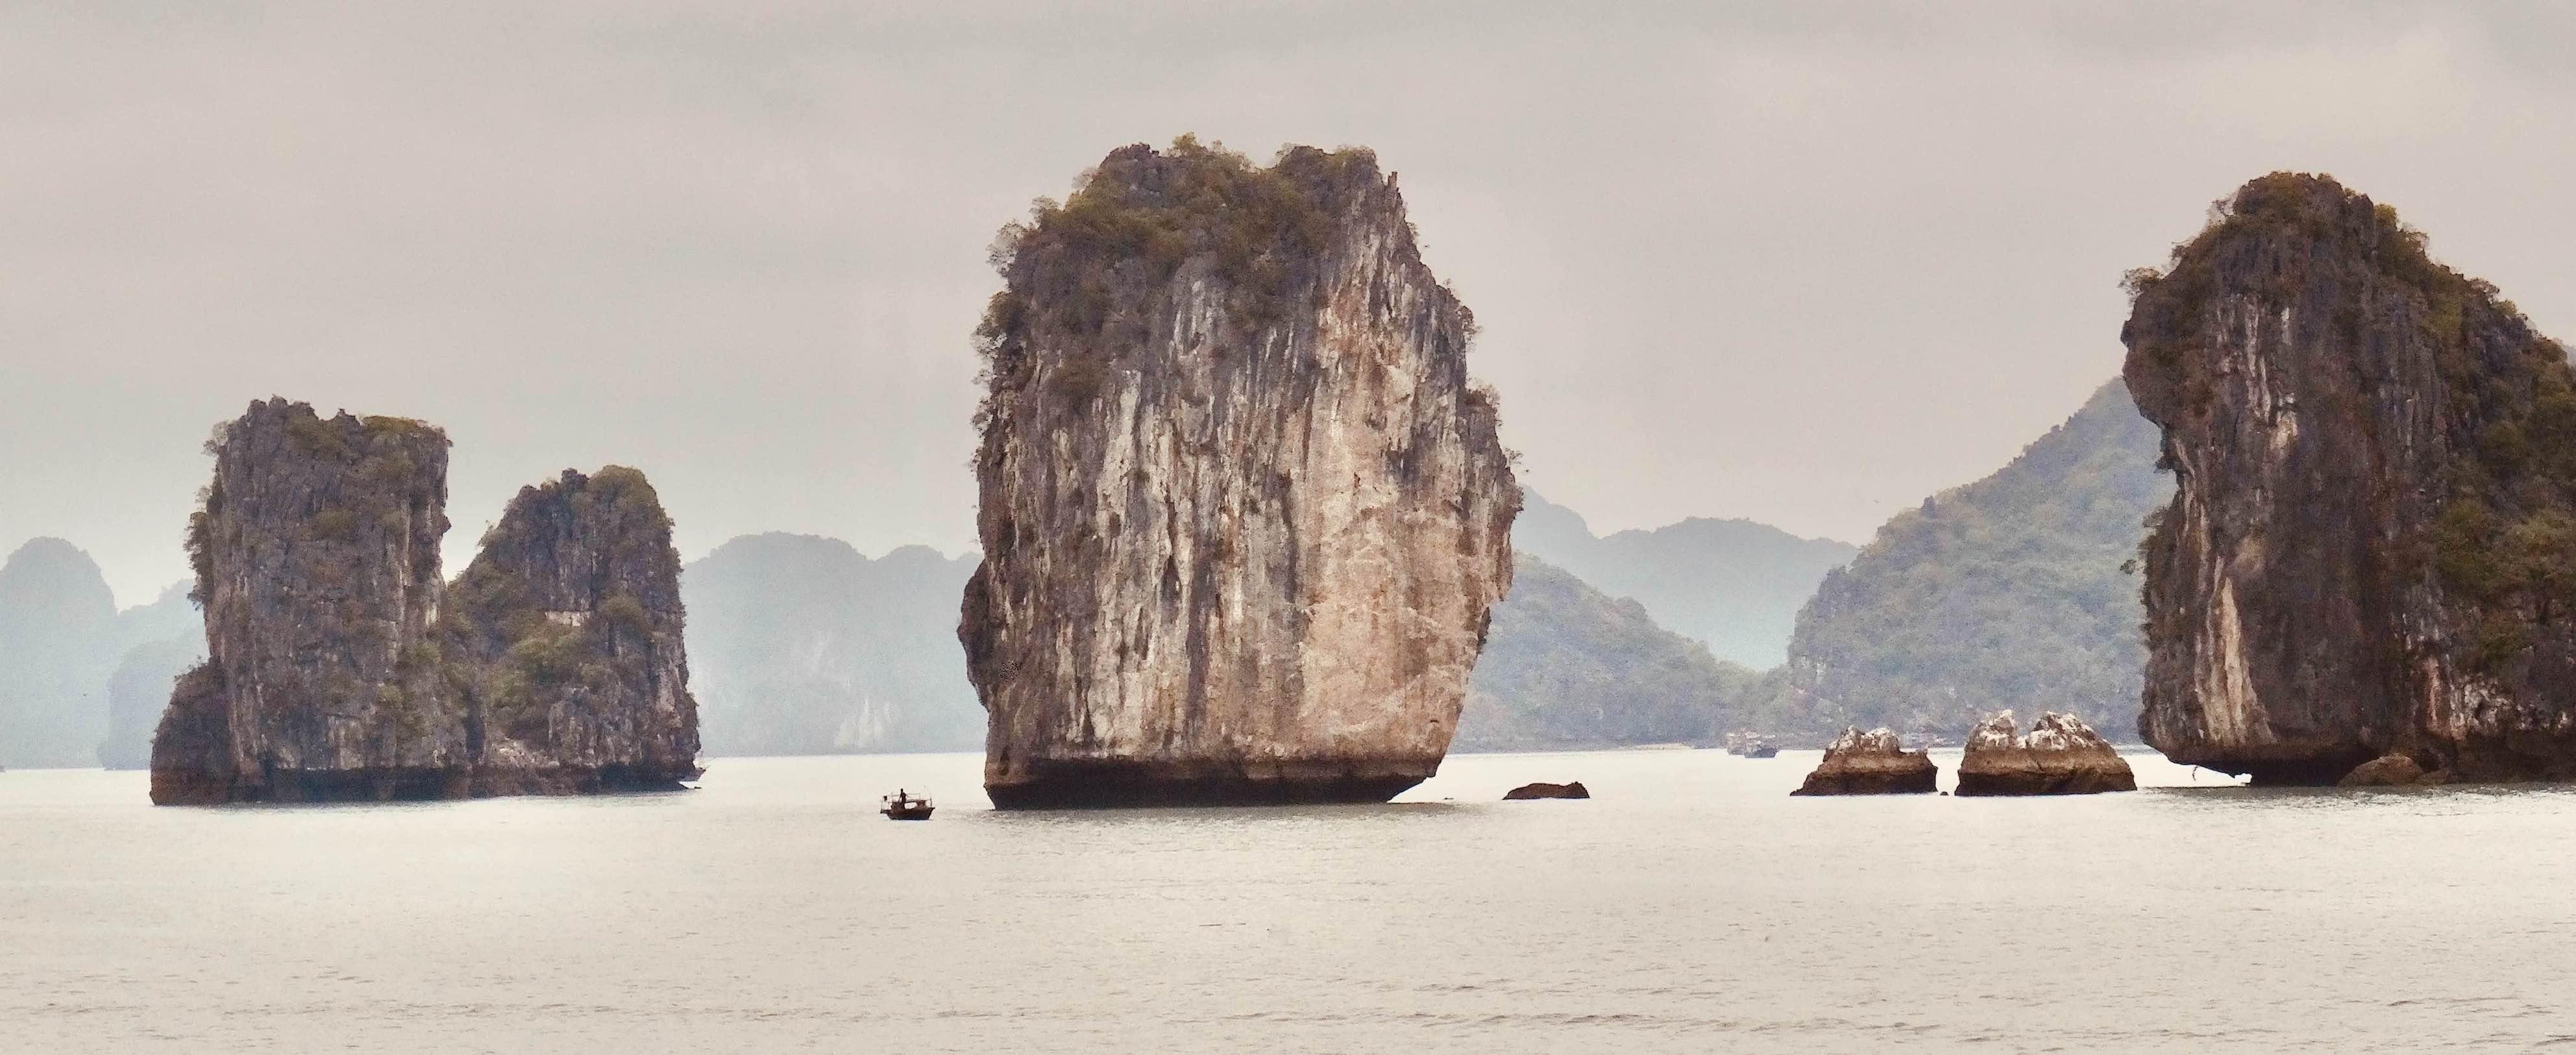 Halong Bay Cruise guide.